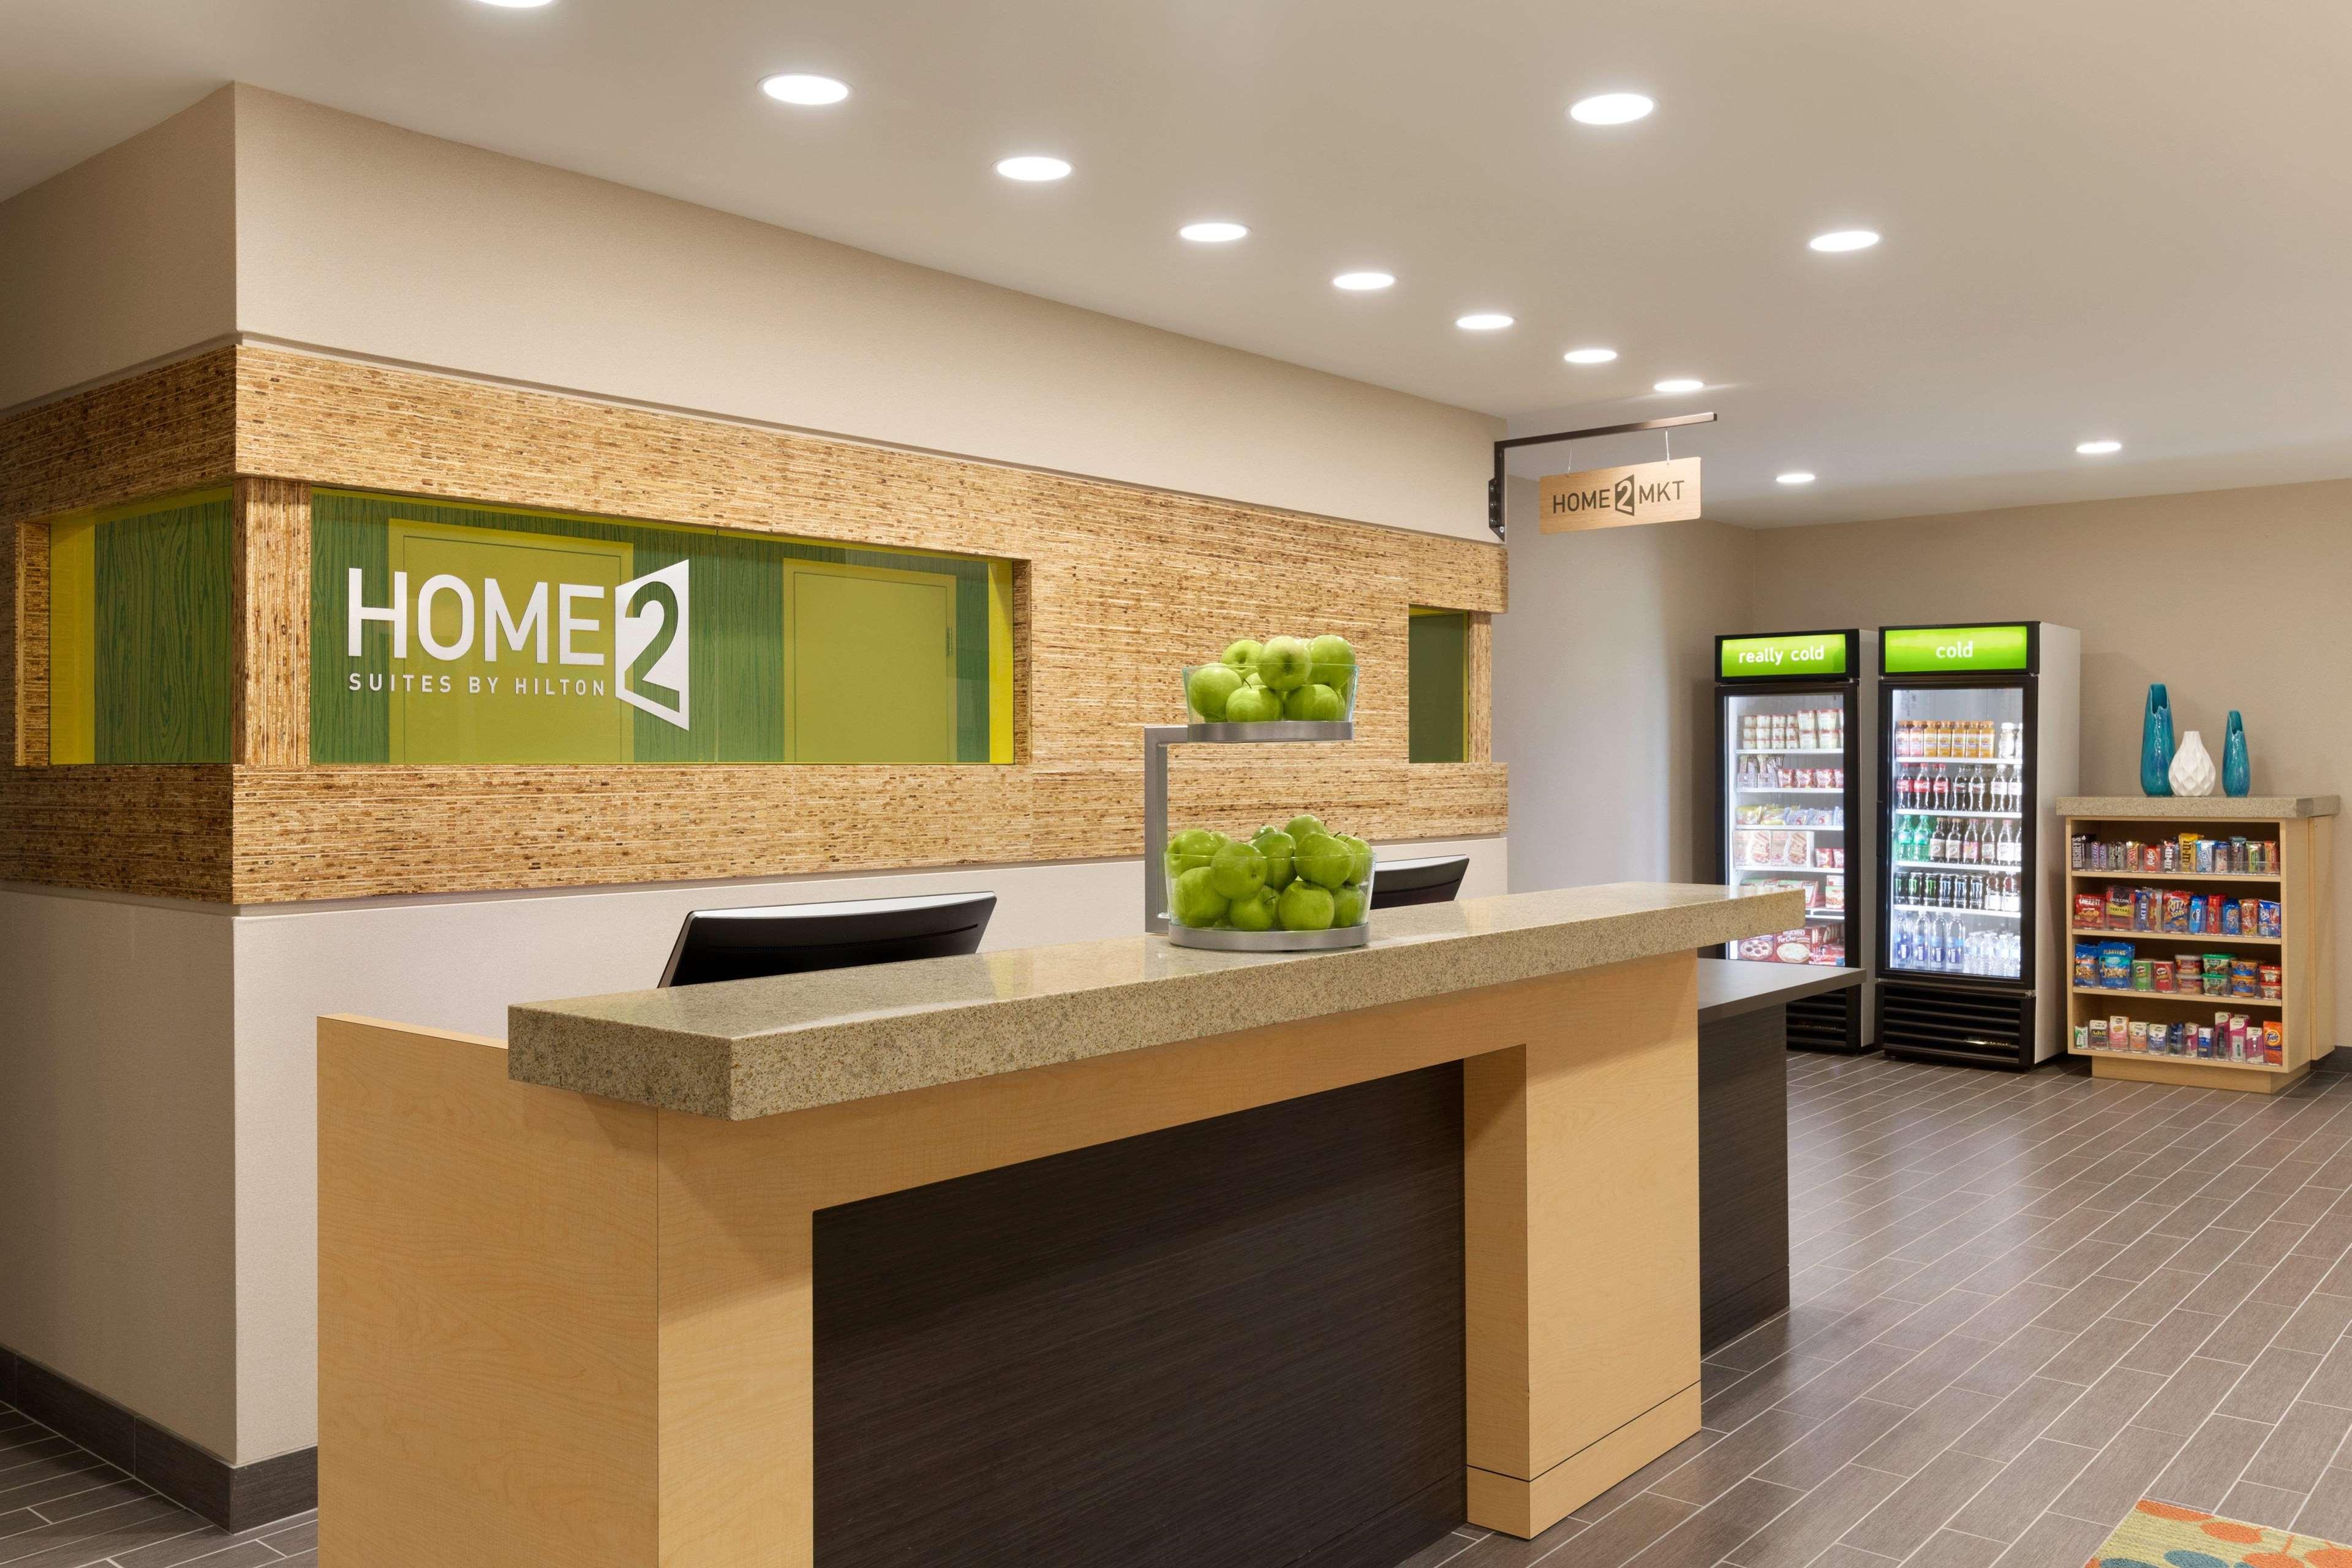 Home2 Suites by Hilton Waco image 1